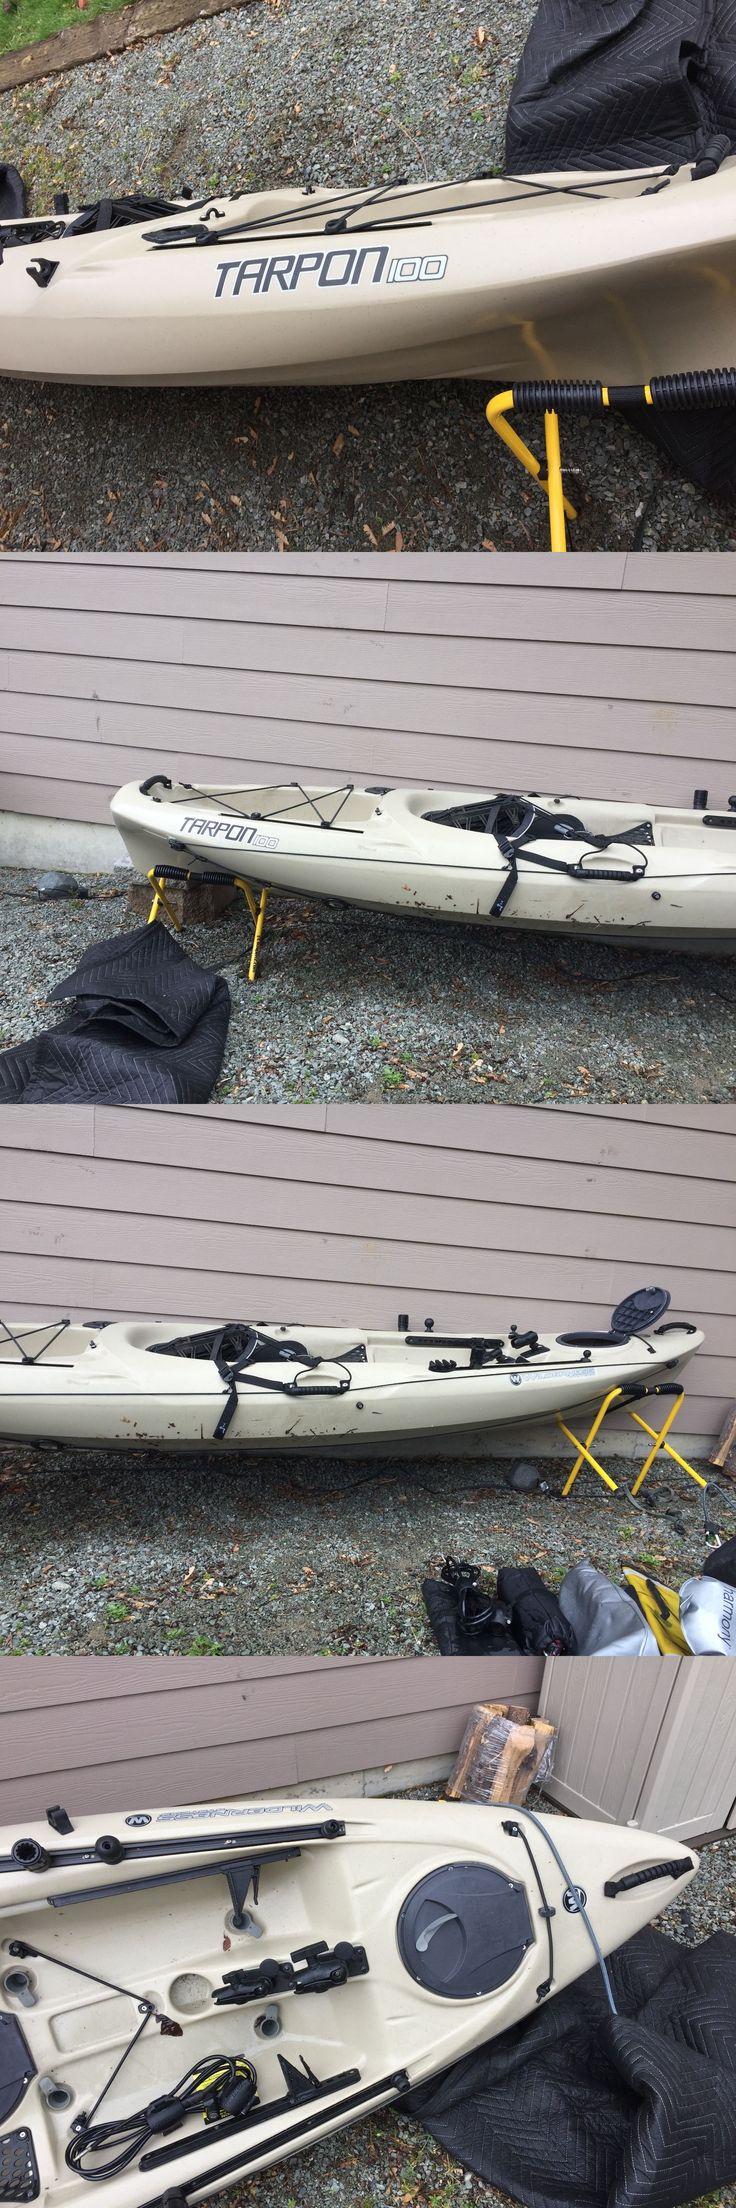 Kayaks 36122: Wilderness Systems Tarpon 100 Kayak - Sand Unused -> BUY IT NOW ONLY: $600 on eBay!